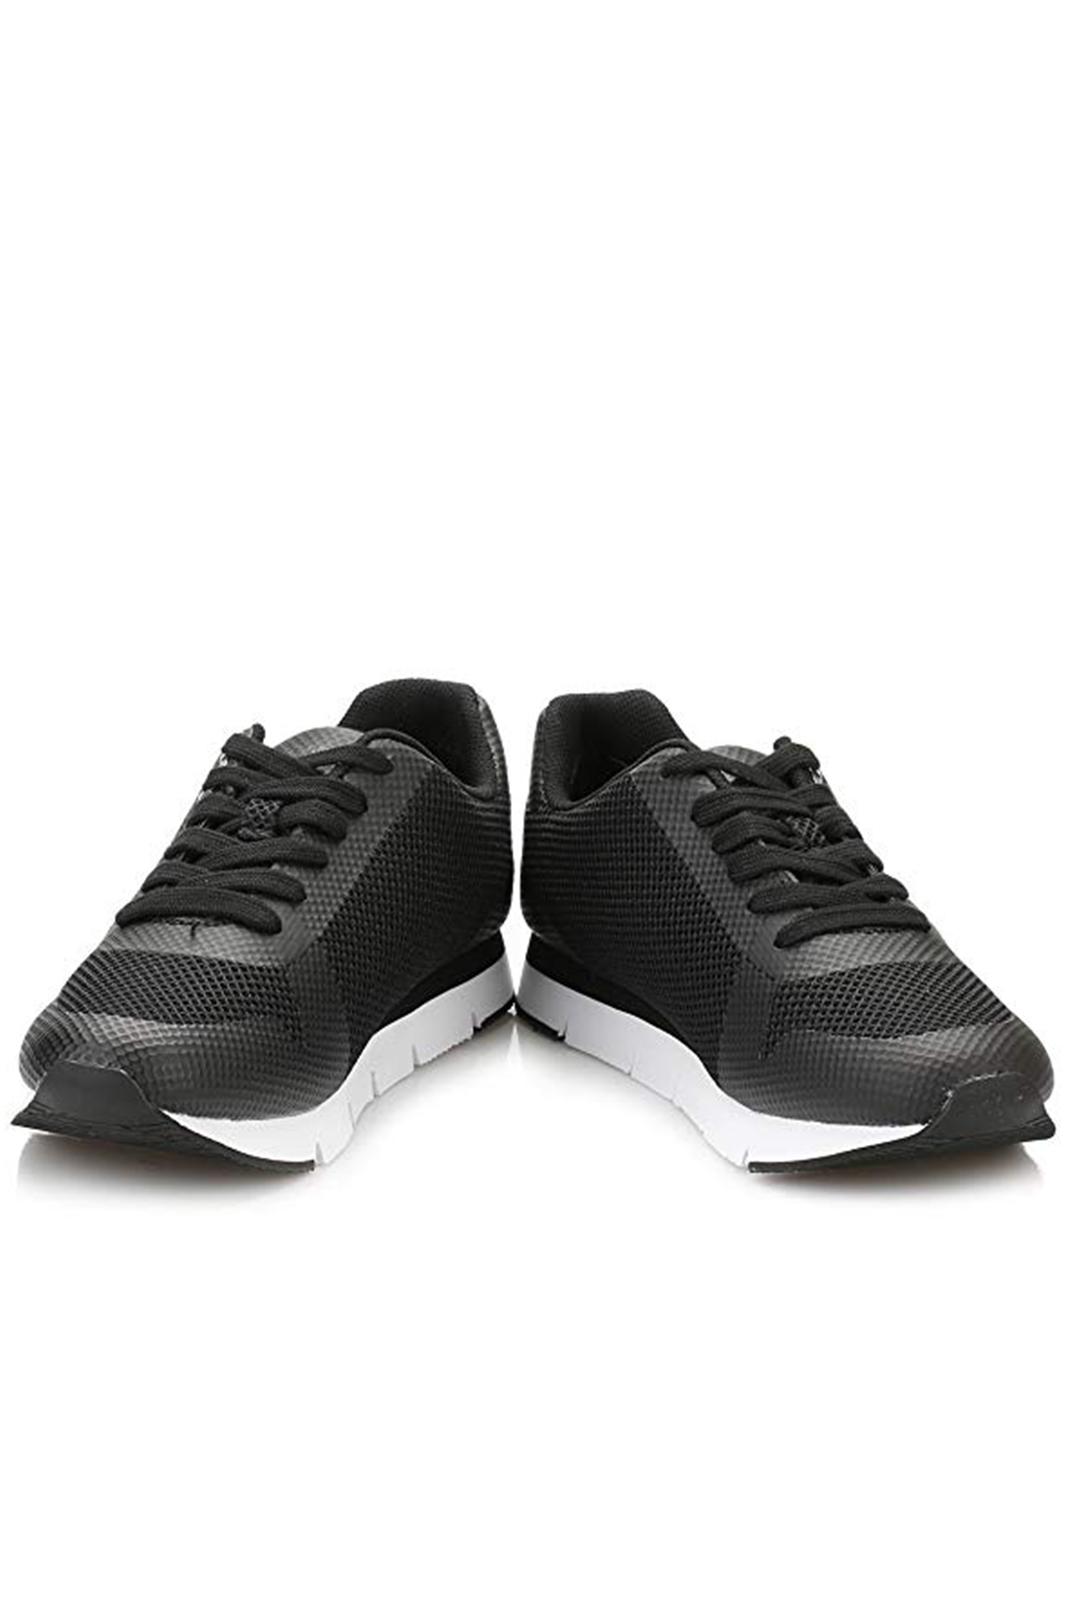 Baskets / Sneakers  Calvin klein TALINE MESH BLACK